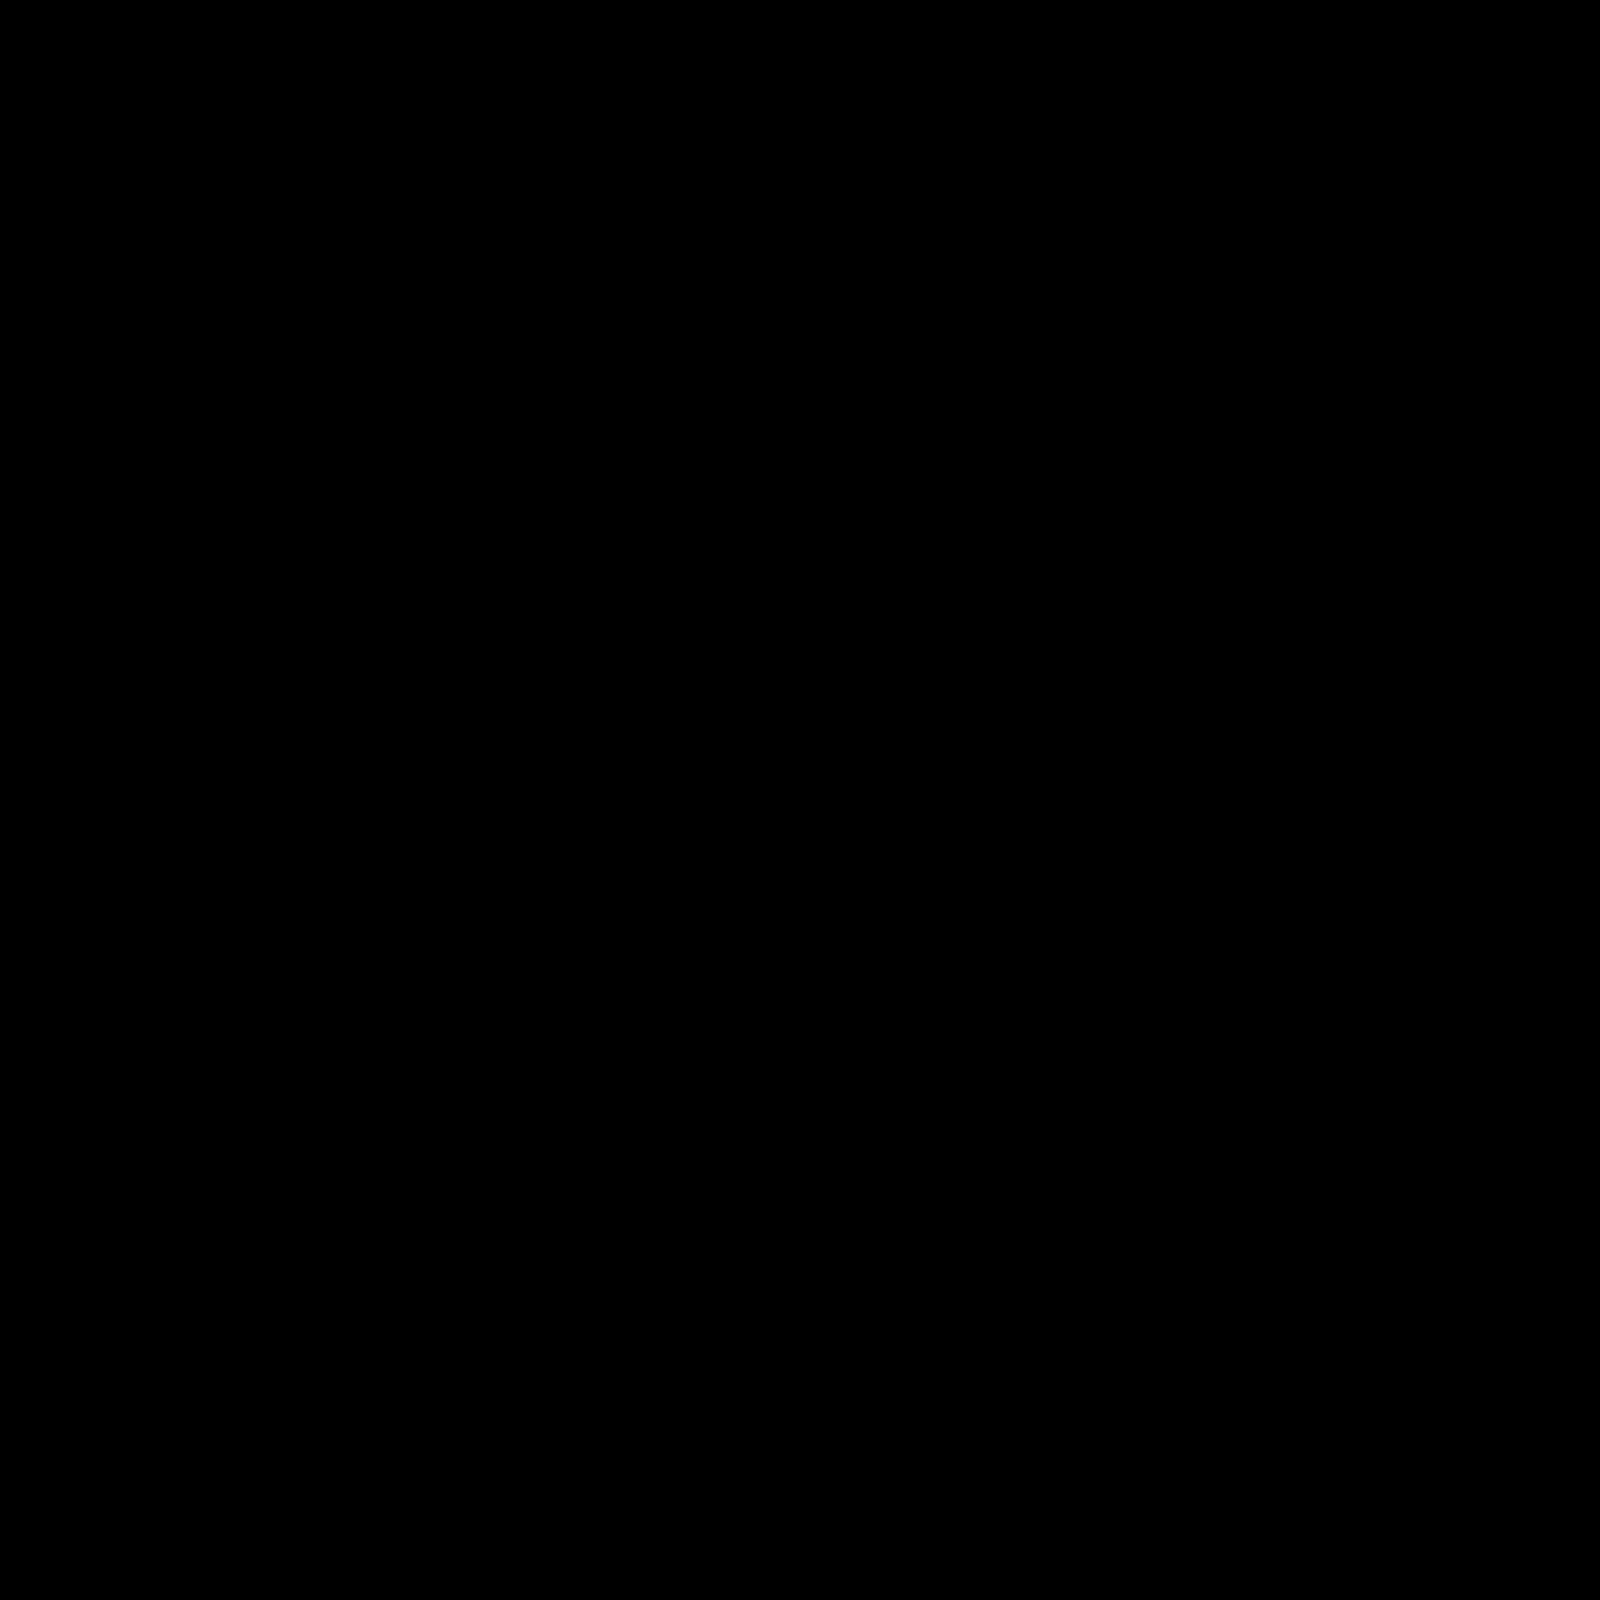 Finestra pop-up icon